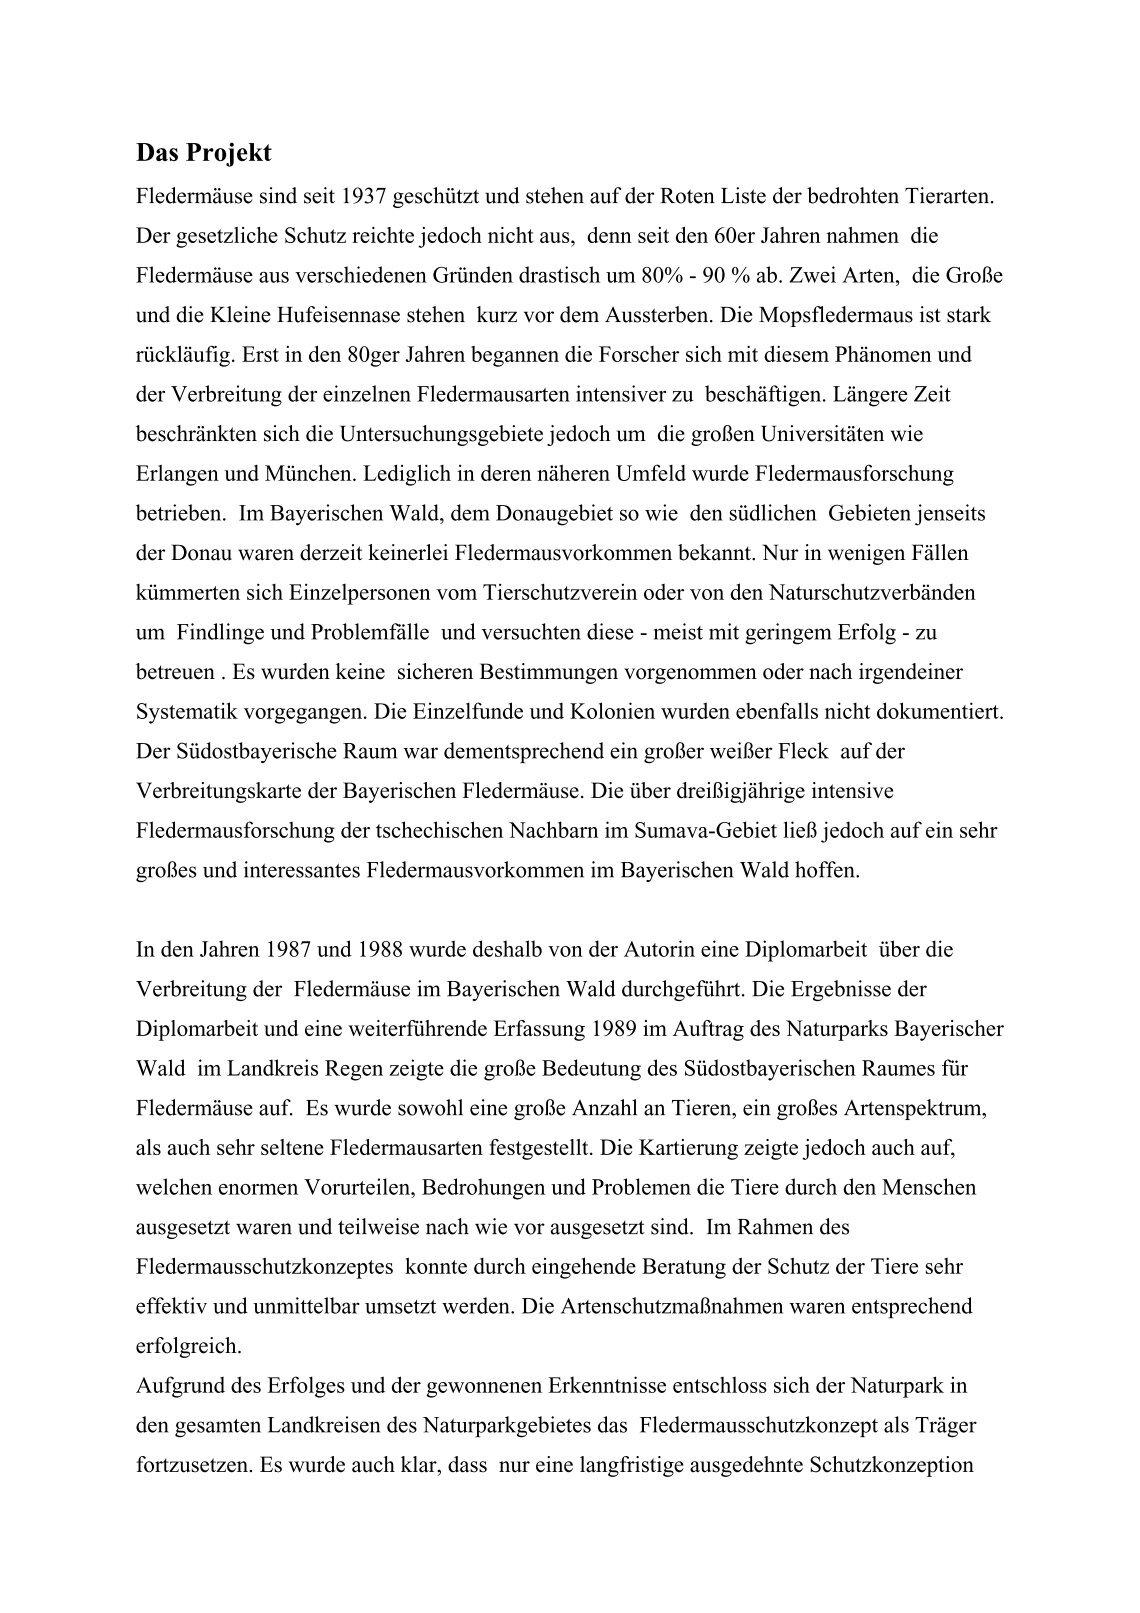 40 free Magazines from FLEDERMAUS.BAYERN.DE